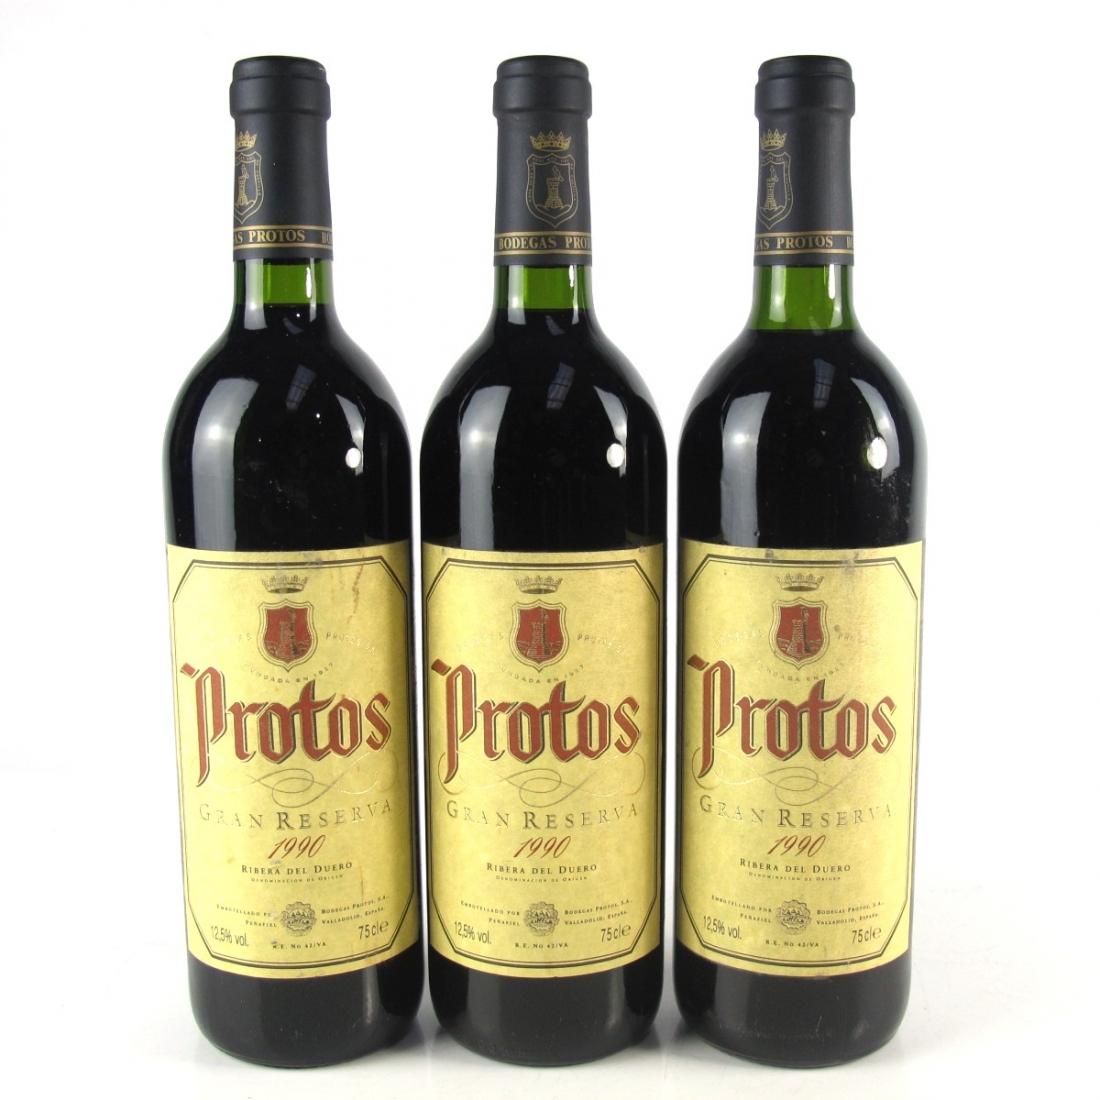 Protos 1990 Ribera Del Duero Gran Reserva 3x75cl